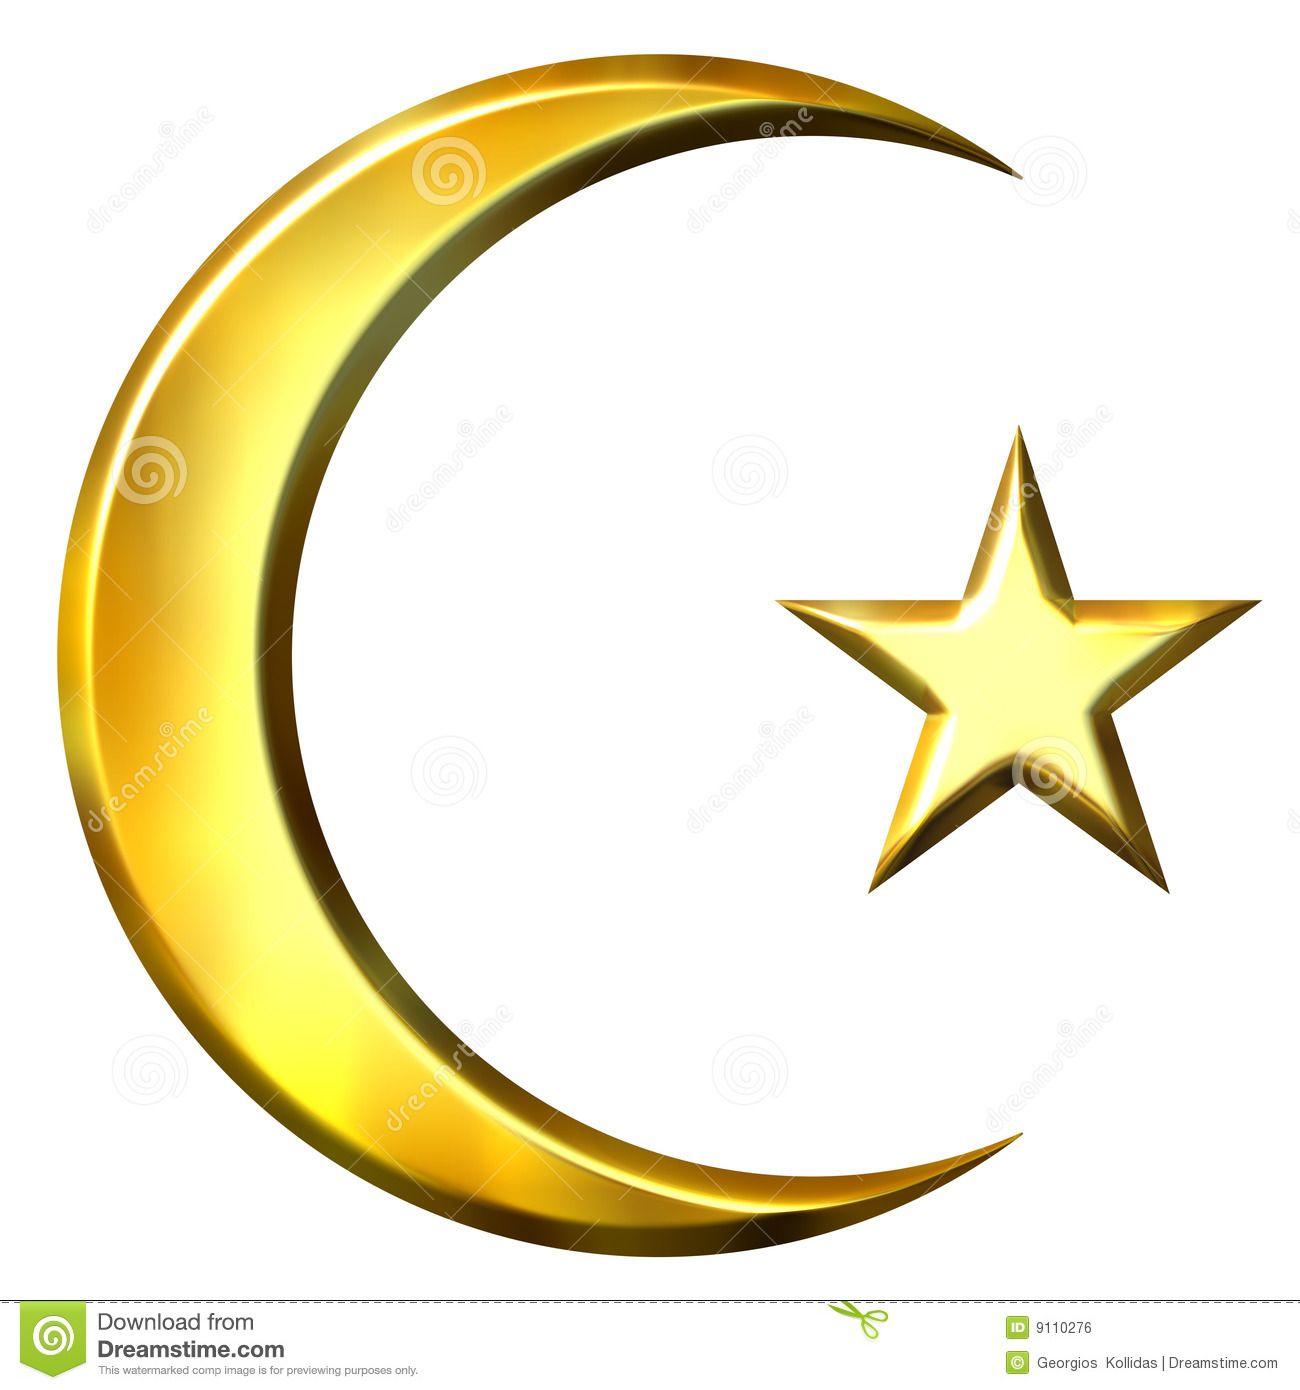 Islam symbol crescent and star golden symbols of islamic faith crescent and star golden symbols of islamic faith white background jewish muslim emblems symbols pinterest crescents symbols and i buycottarizona Gallery